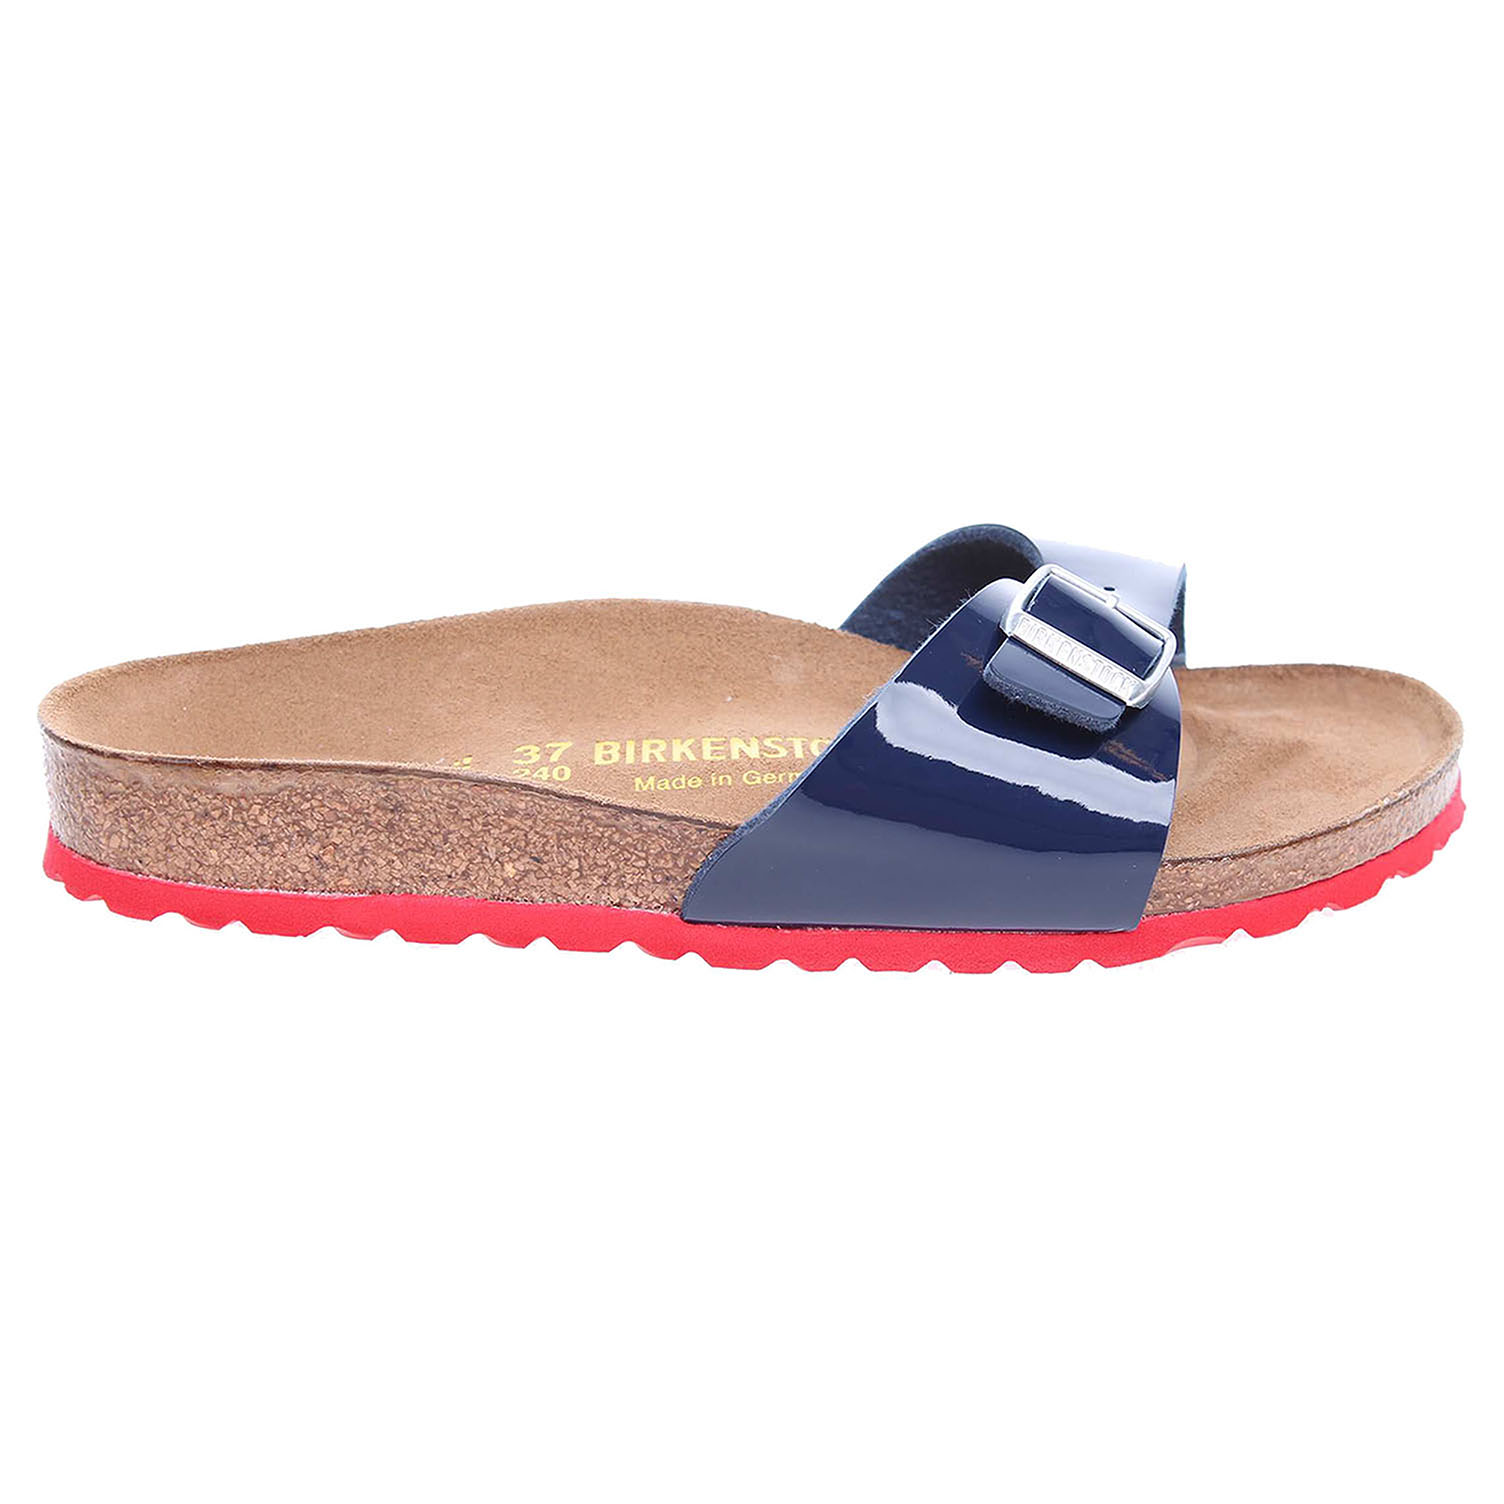 Birkenstock Madrid dámské pantofle 339263 modrá 41